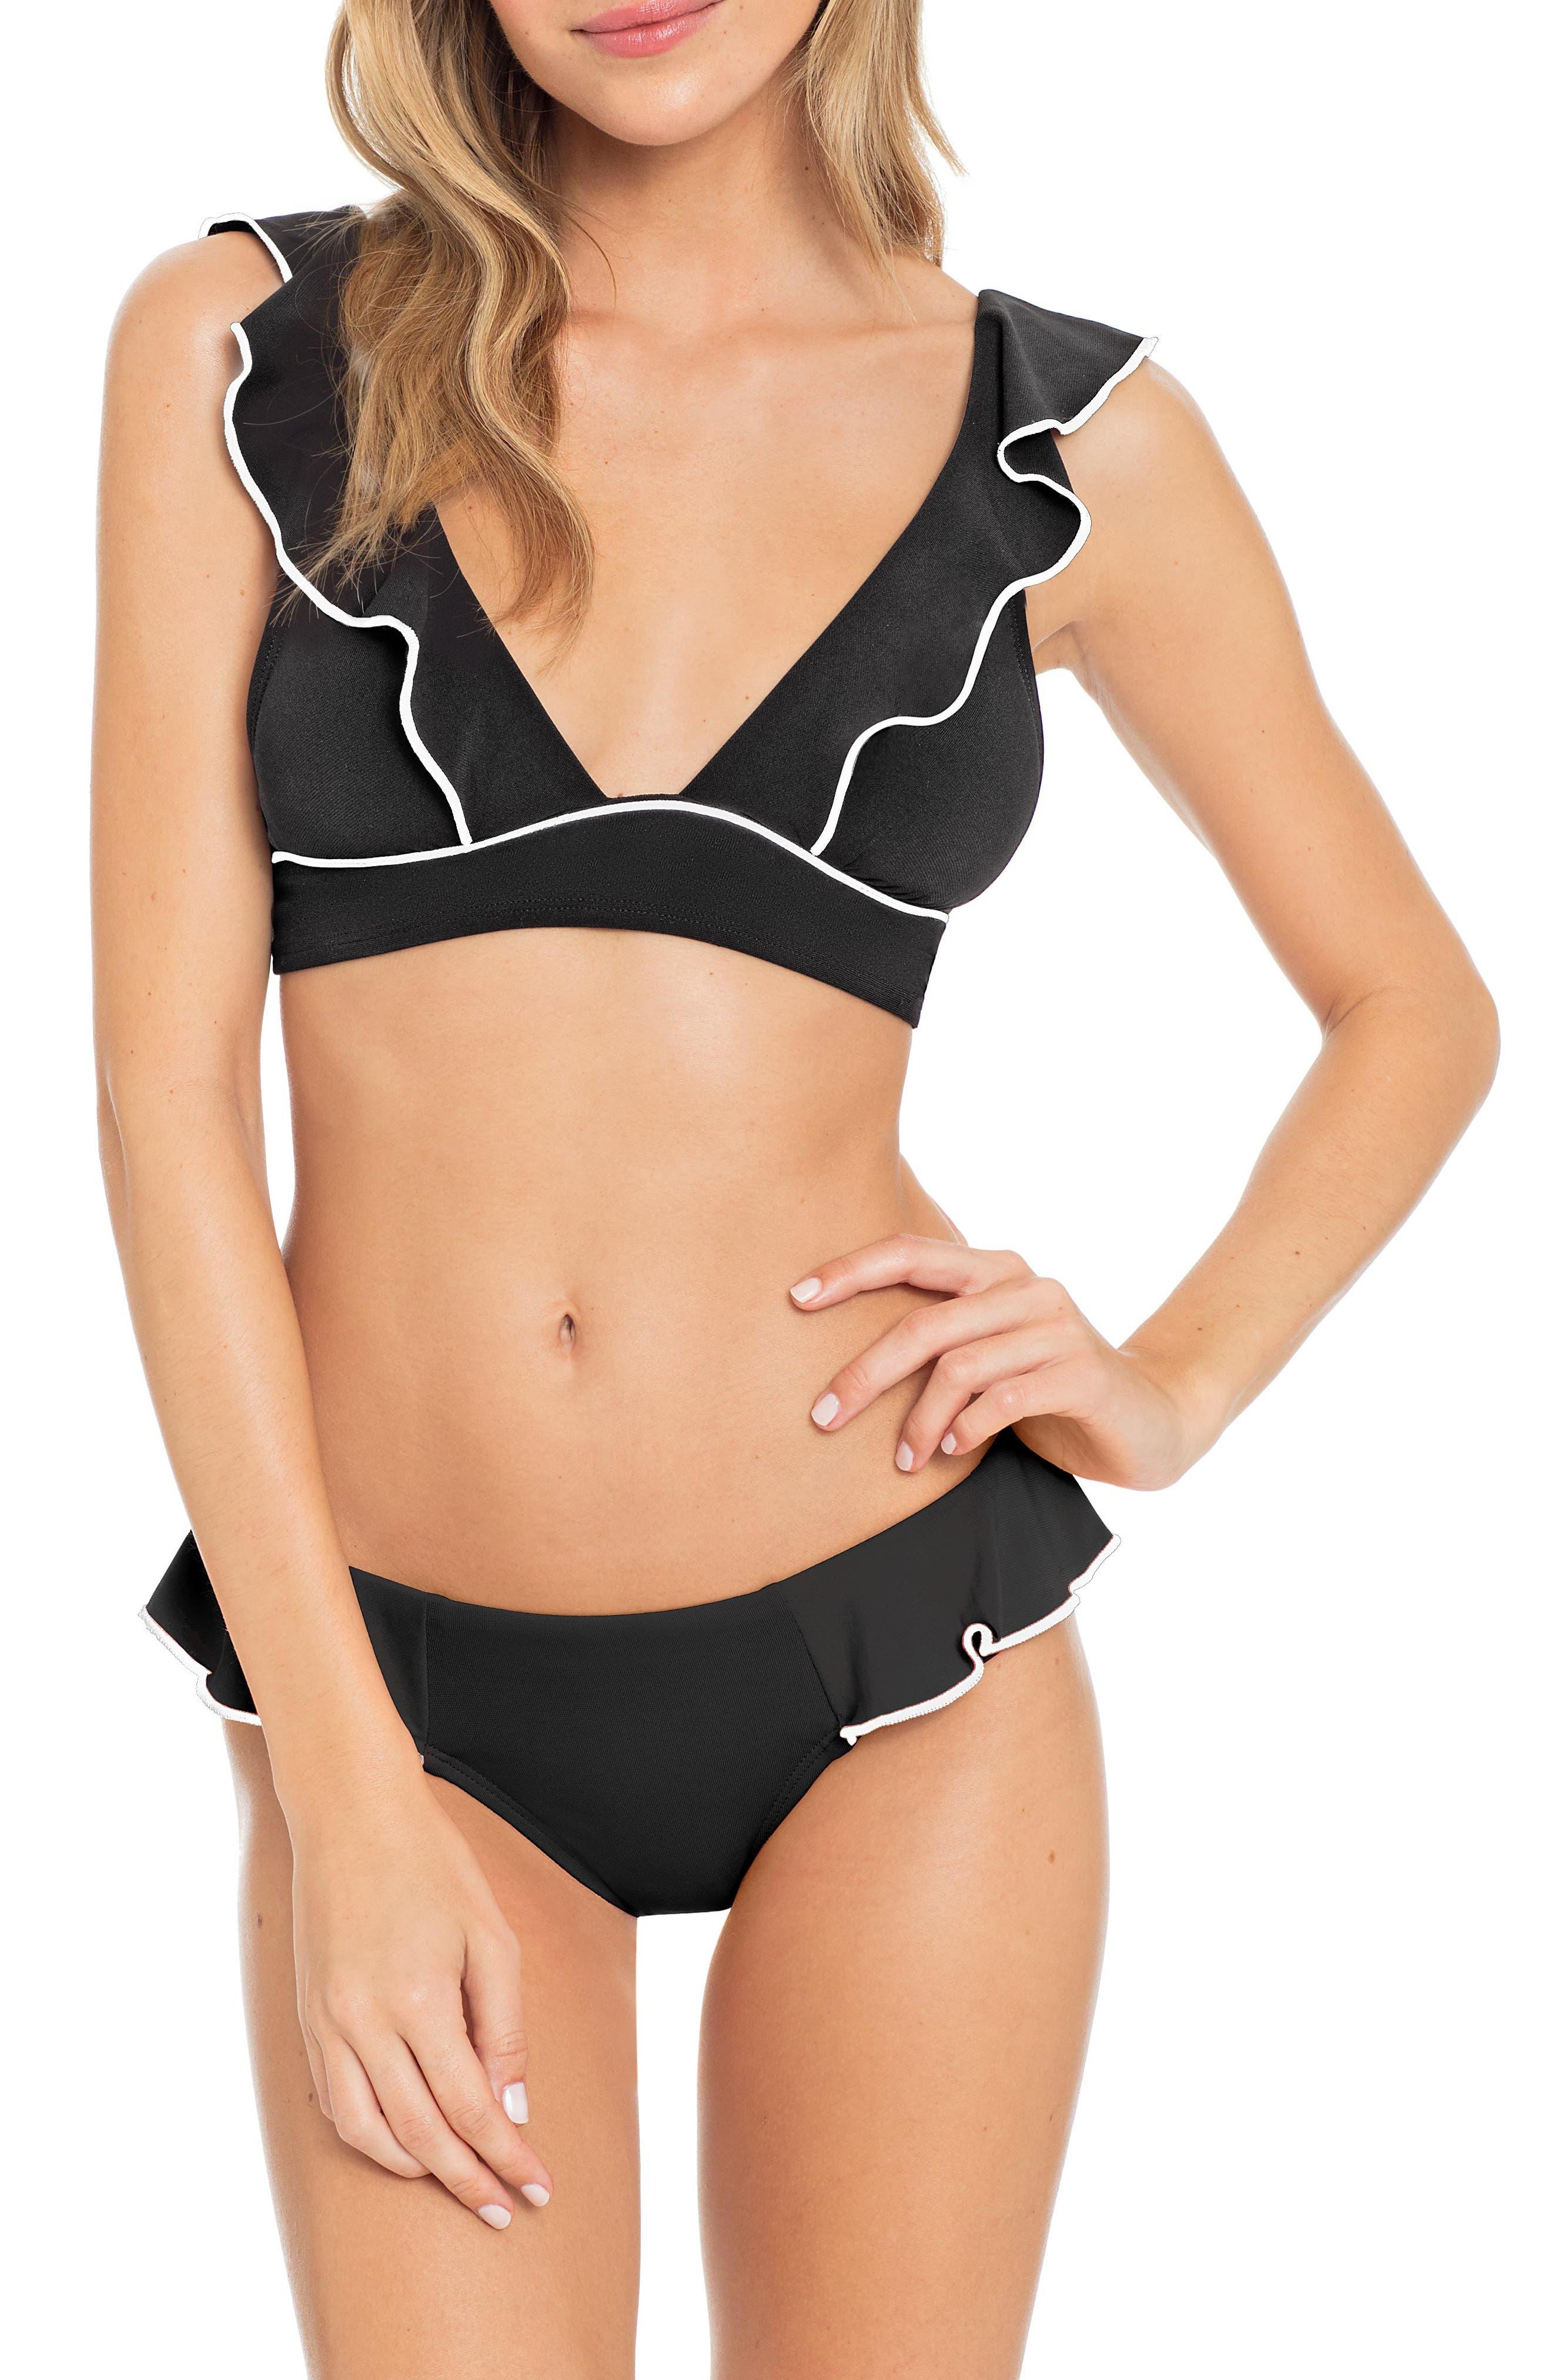 Malia Ruffle Bikini Top,                             Alternate thumbnail 3, color,                             BLACK/ IVORY